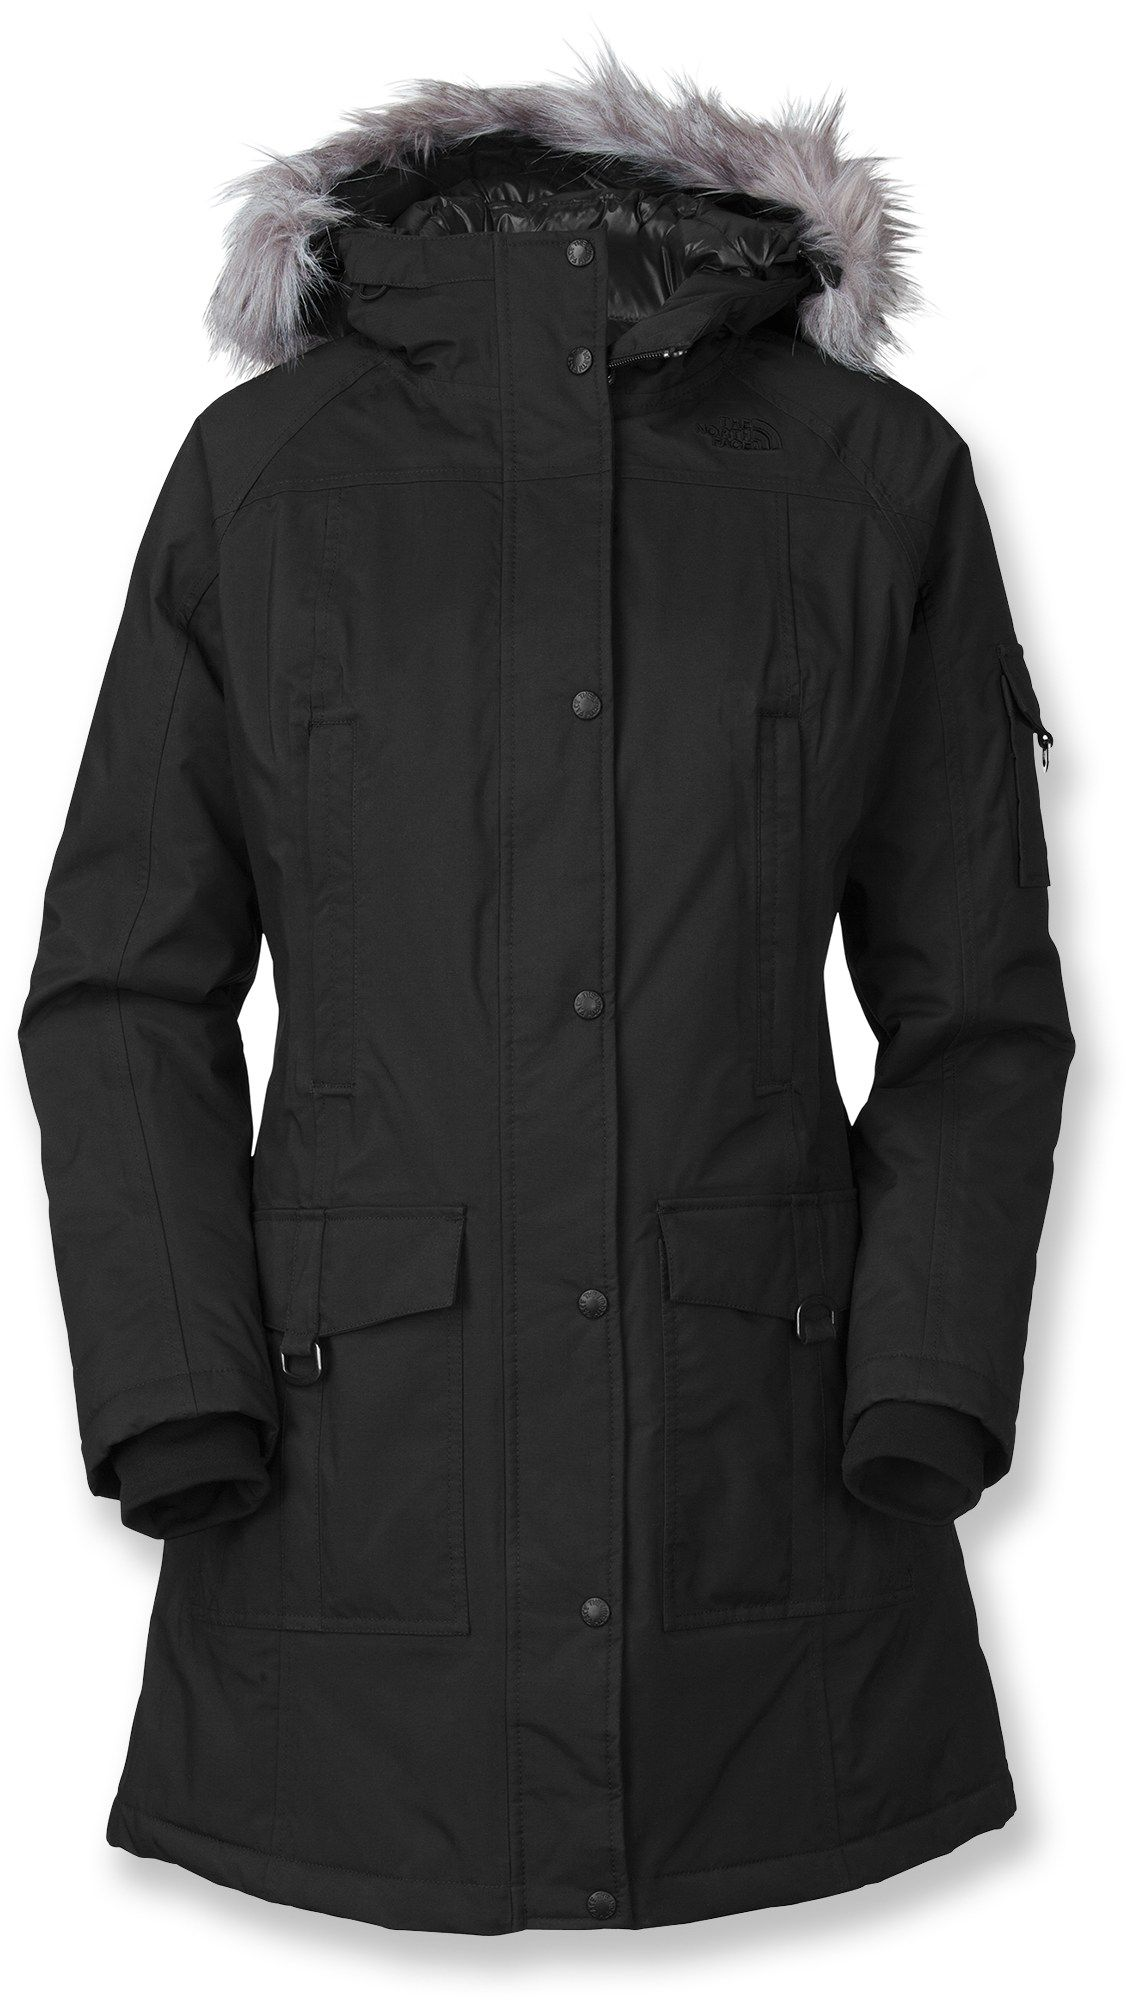 The North Face Juneau Down Jacket Women S Rei Co Op Jackets For Women Jackets Down Jacket [ 2000 x 1126 Pixel ]